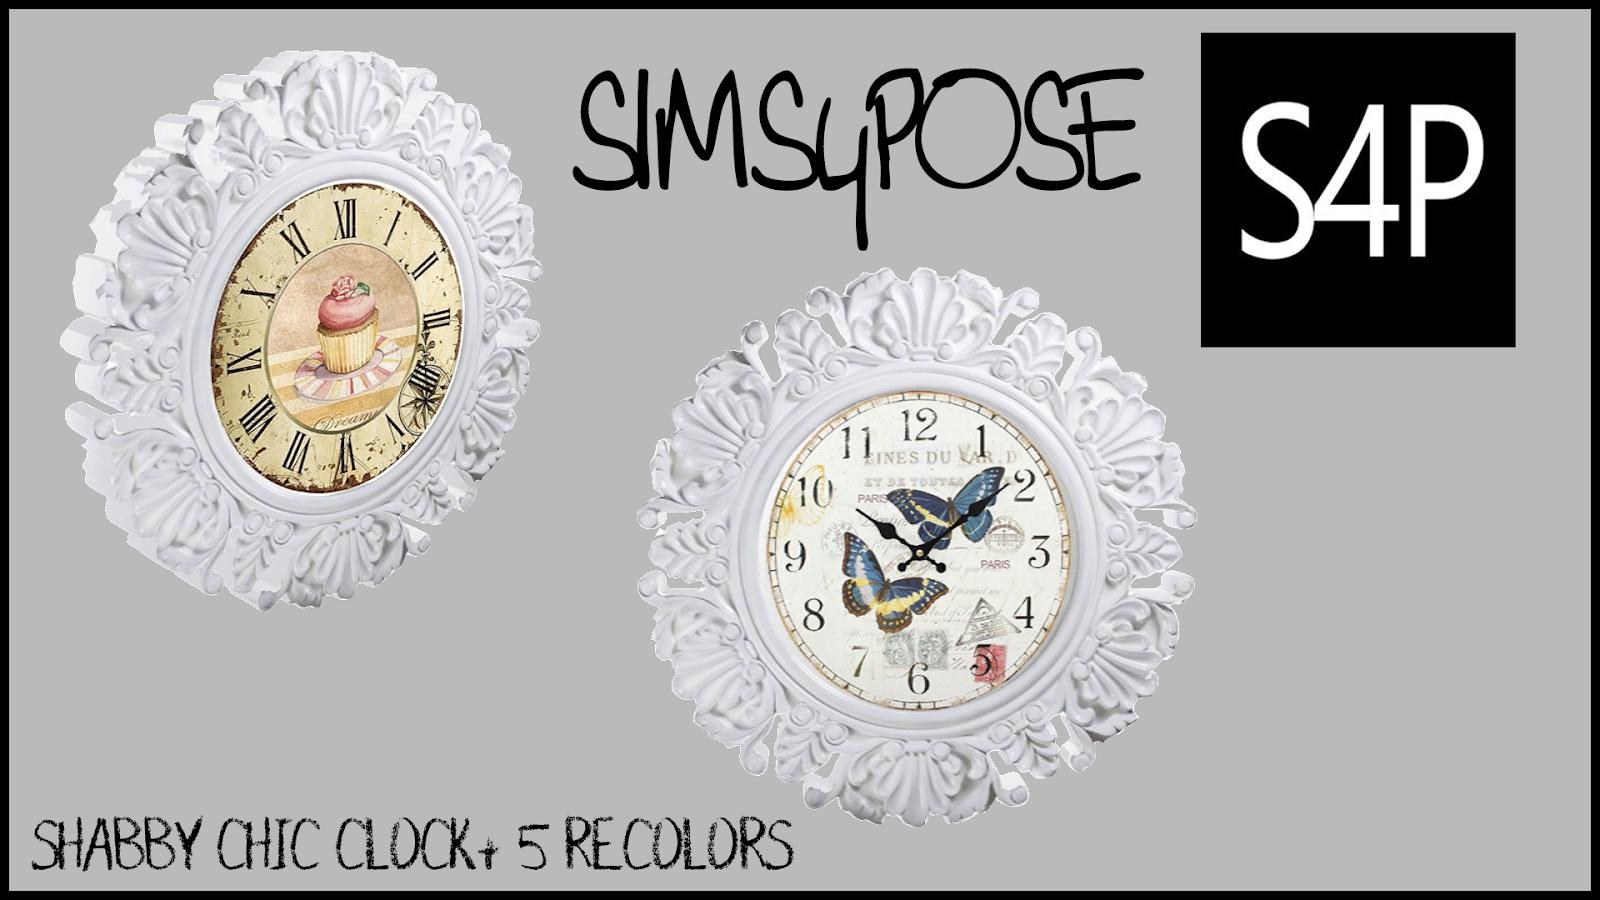 Sims 4 Pose Shabby Chic Wall Clock Decor